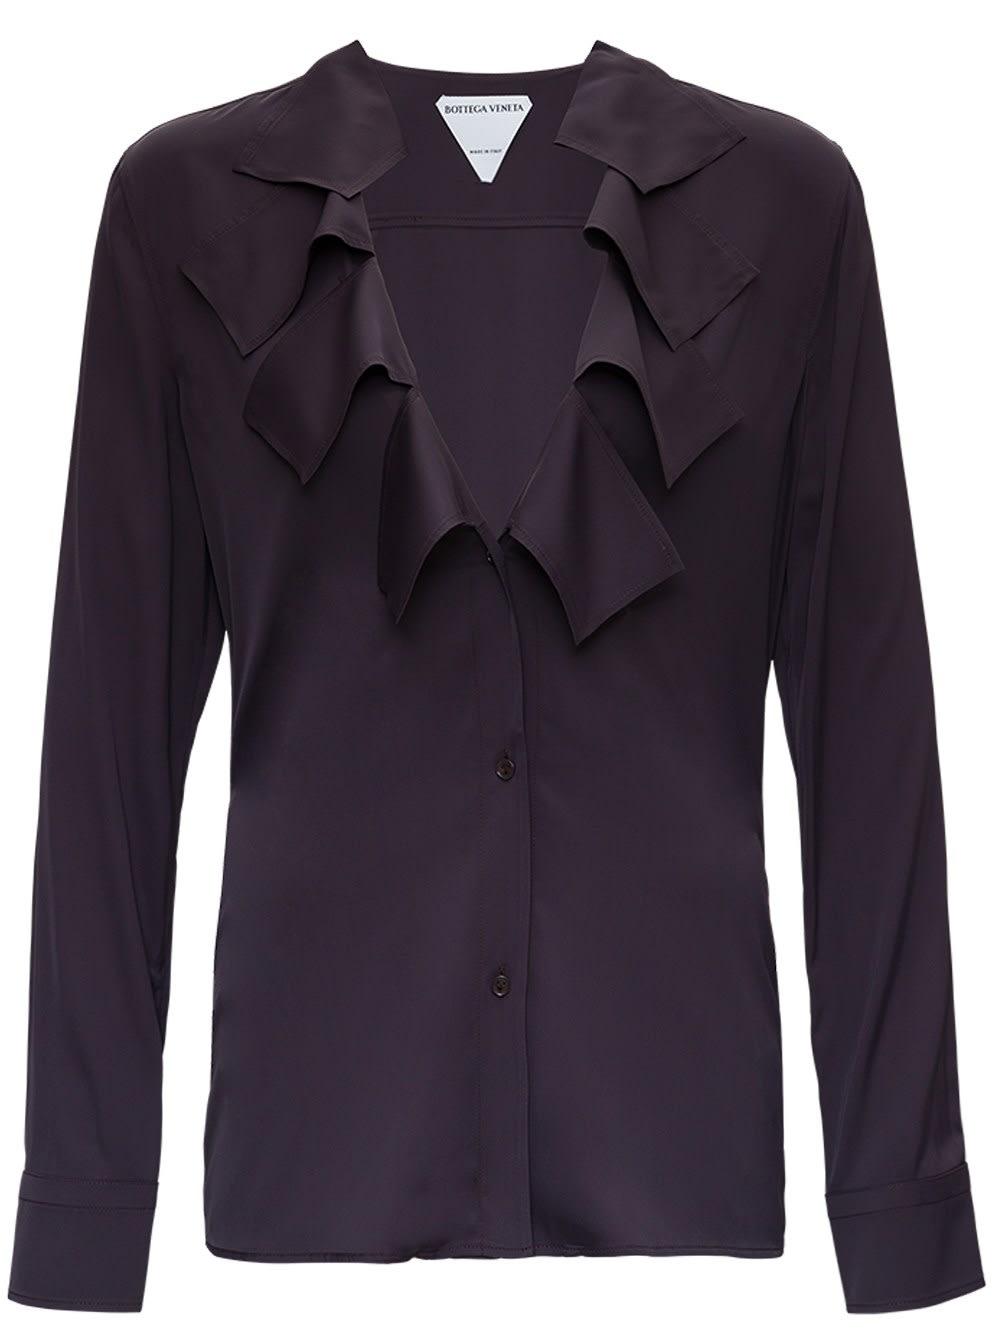 Bottega Veneta Shirts STRETCH VISCOSE SHIRT WITH RUFFLES